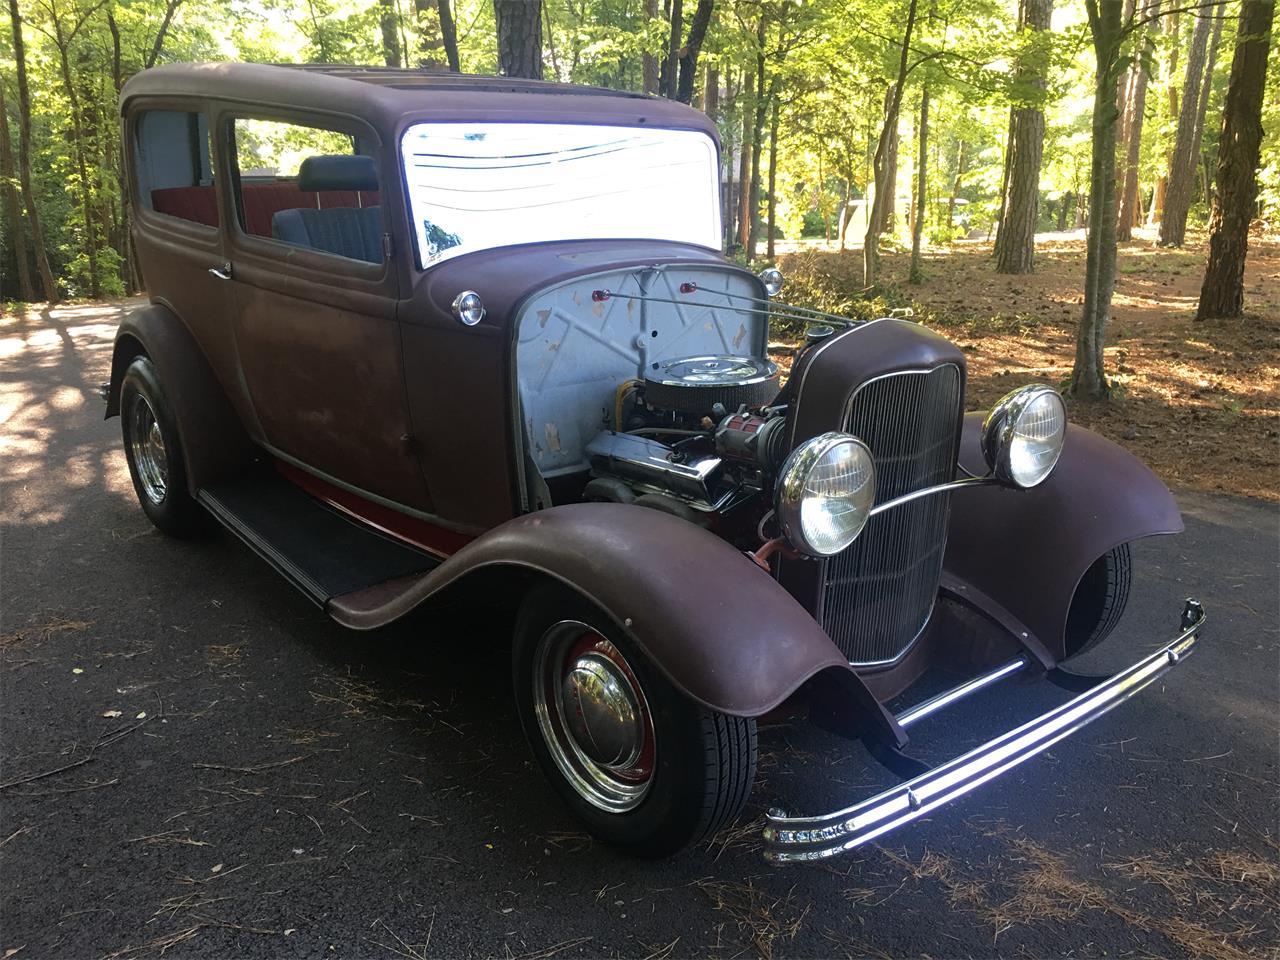 Large Picture of Classic '32 Ford Tudor located in Georgia - $30,000.00 - Q796